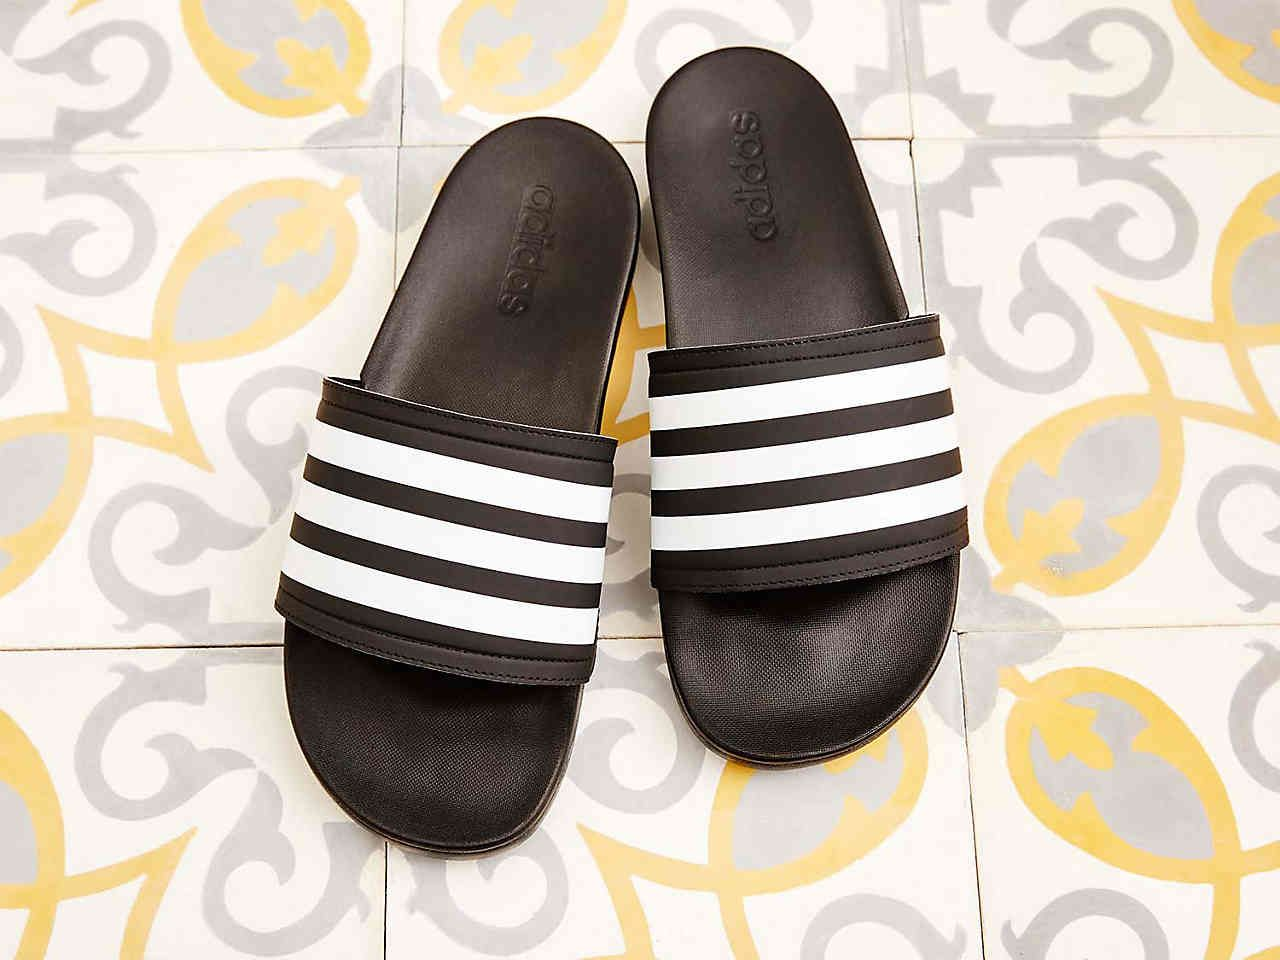 26a20a7a3f127 adidas Adilette Cloudfoam Ultra Stripes Slide Sandal Women s Shoes ...